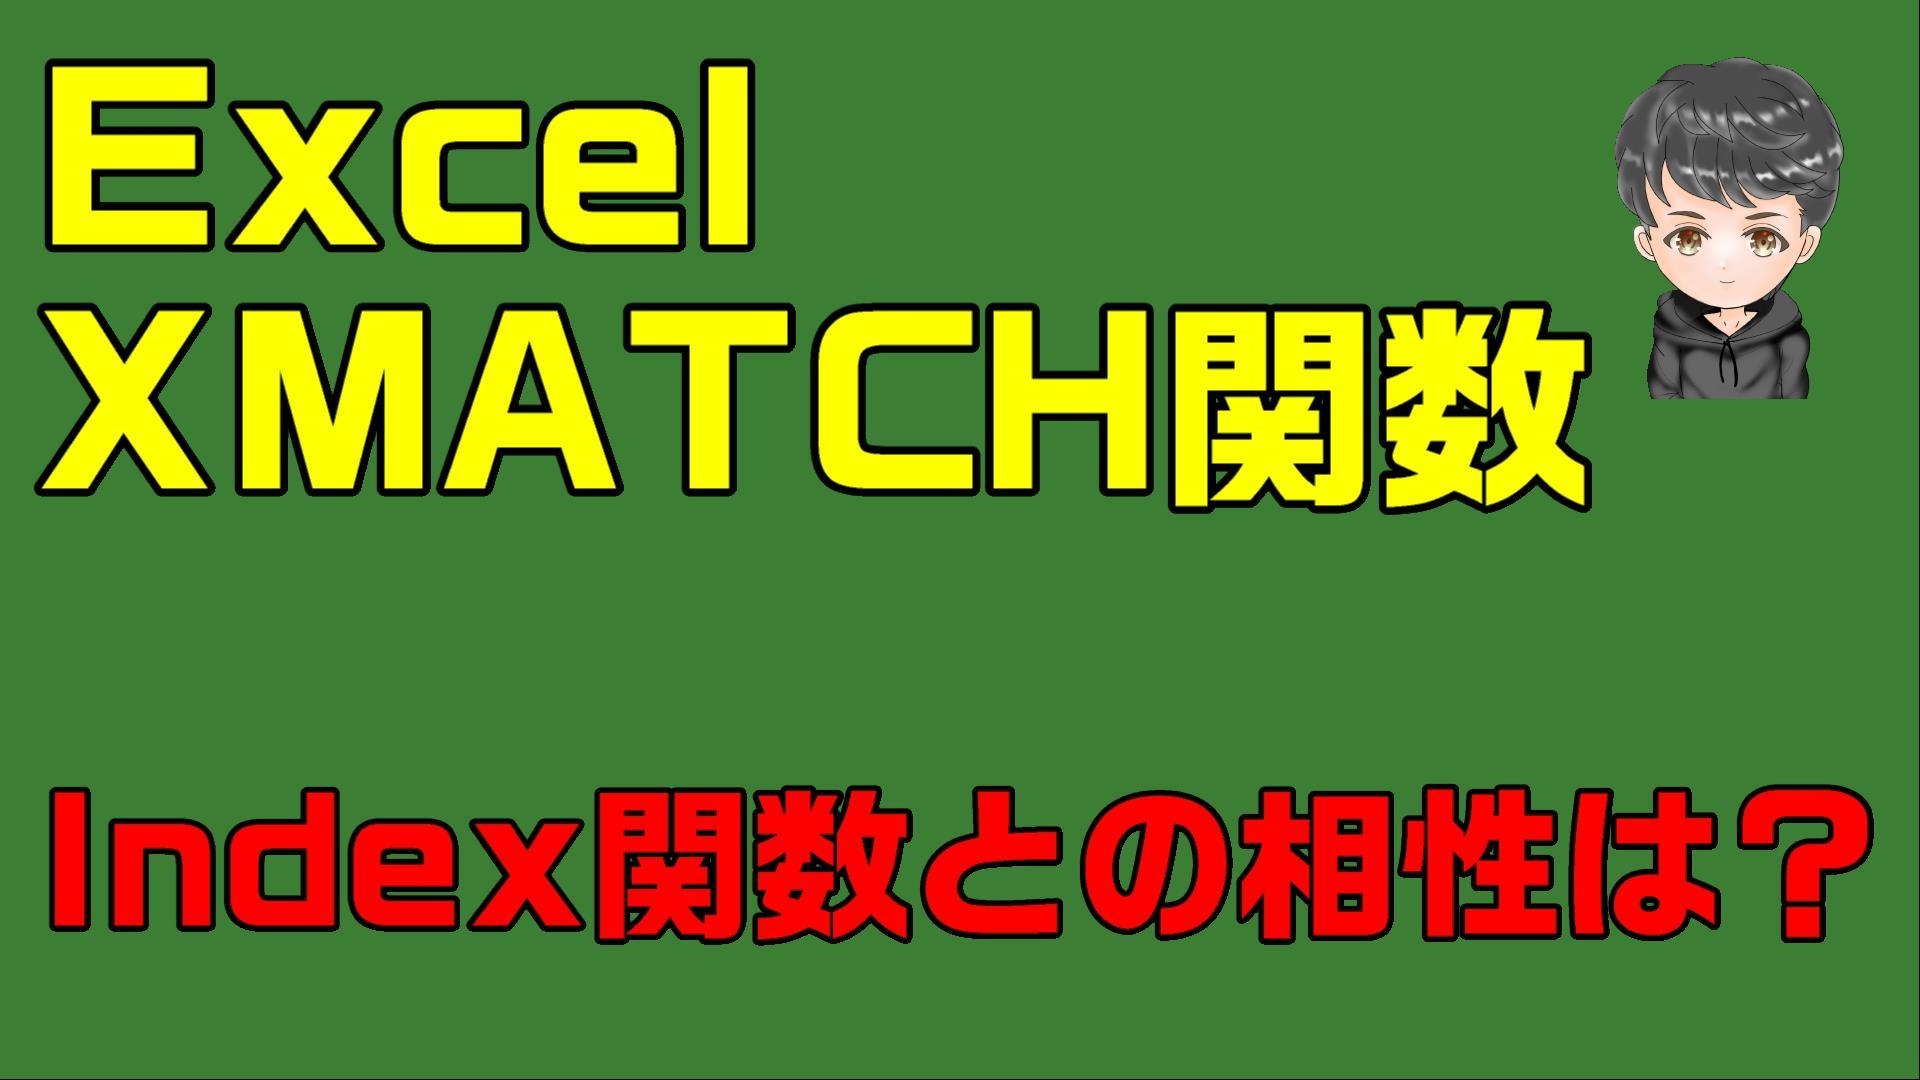 【Excel 関数】XMATCH関数は、不評な関数なのか?